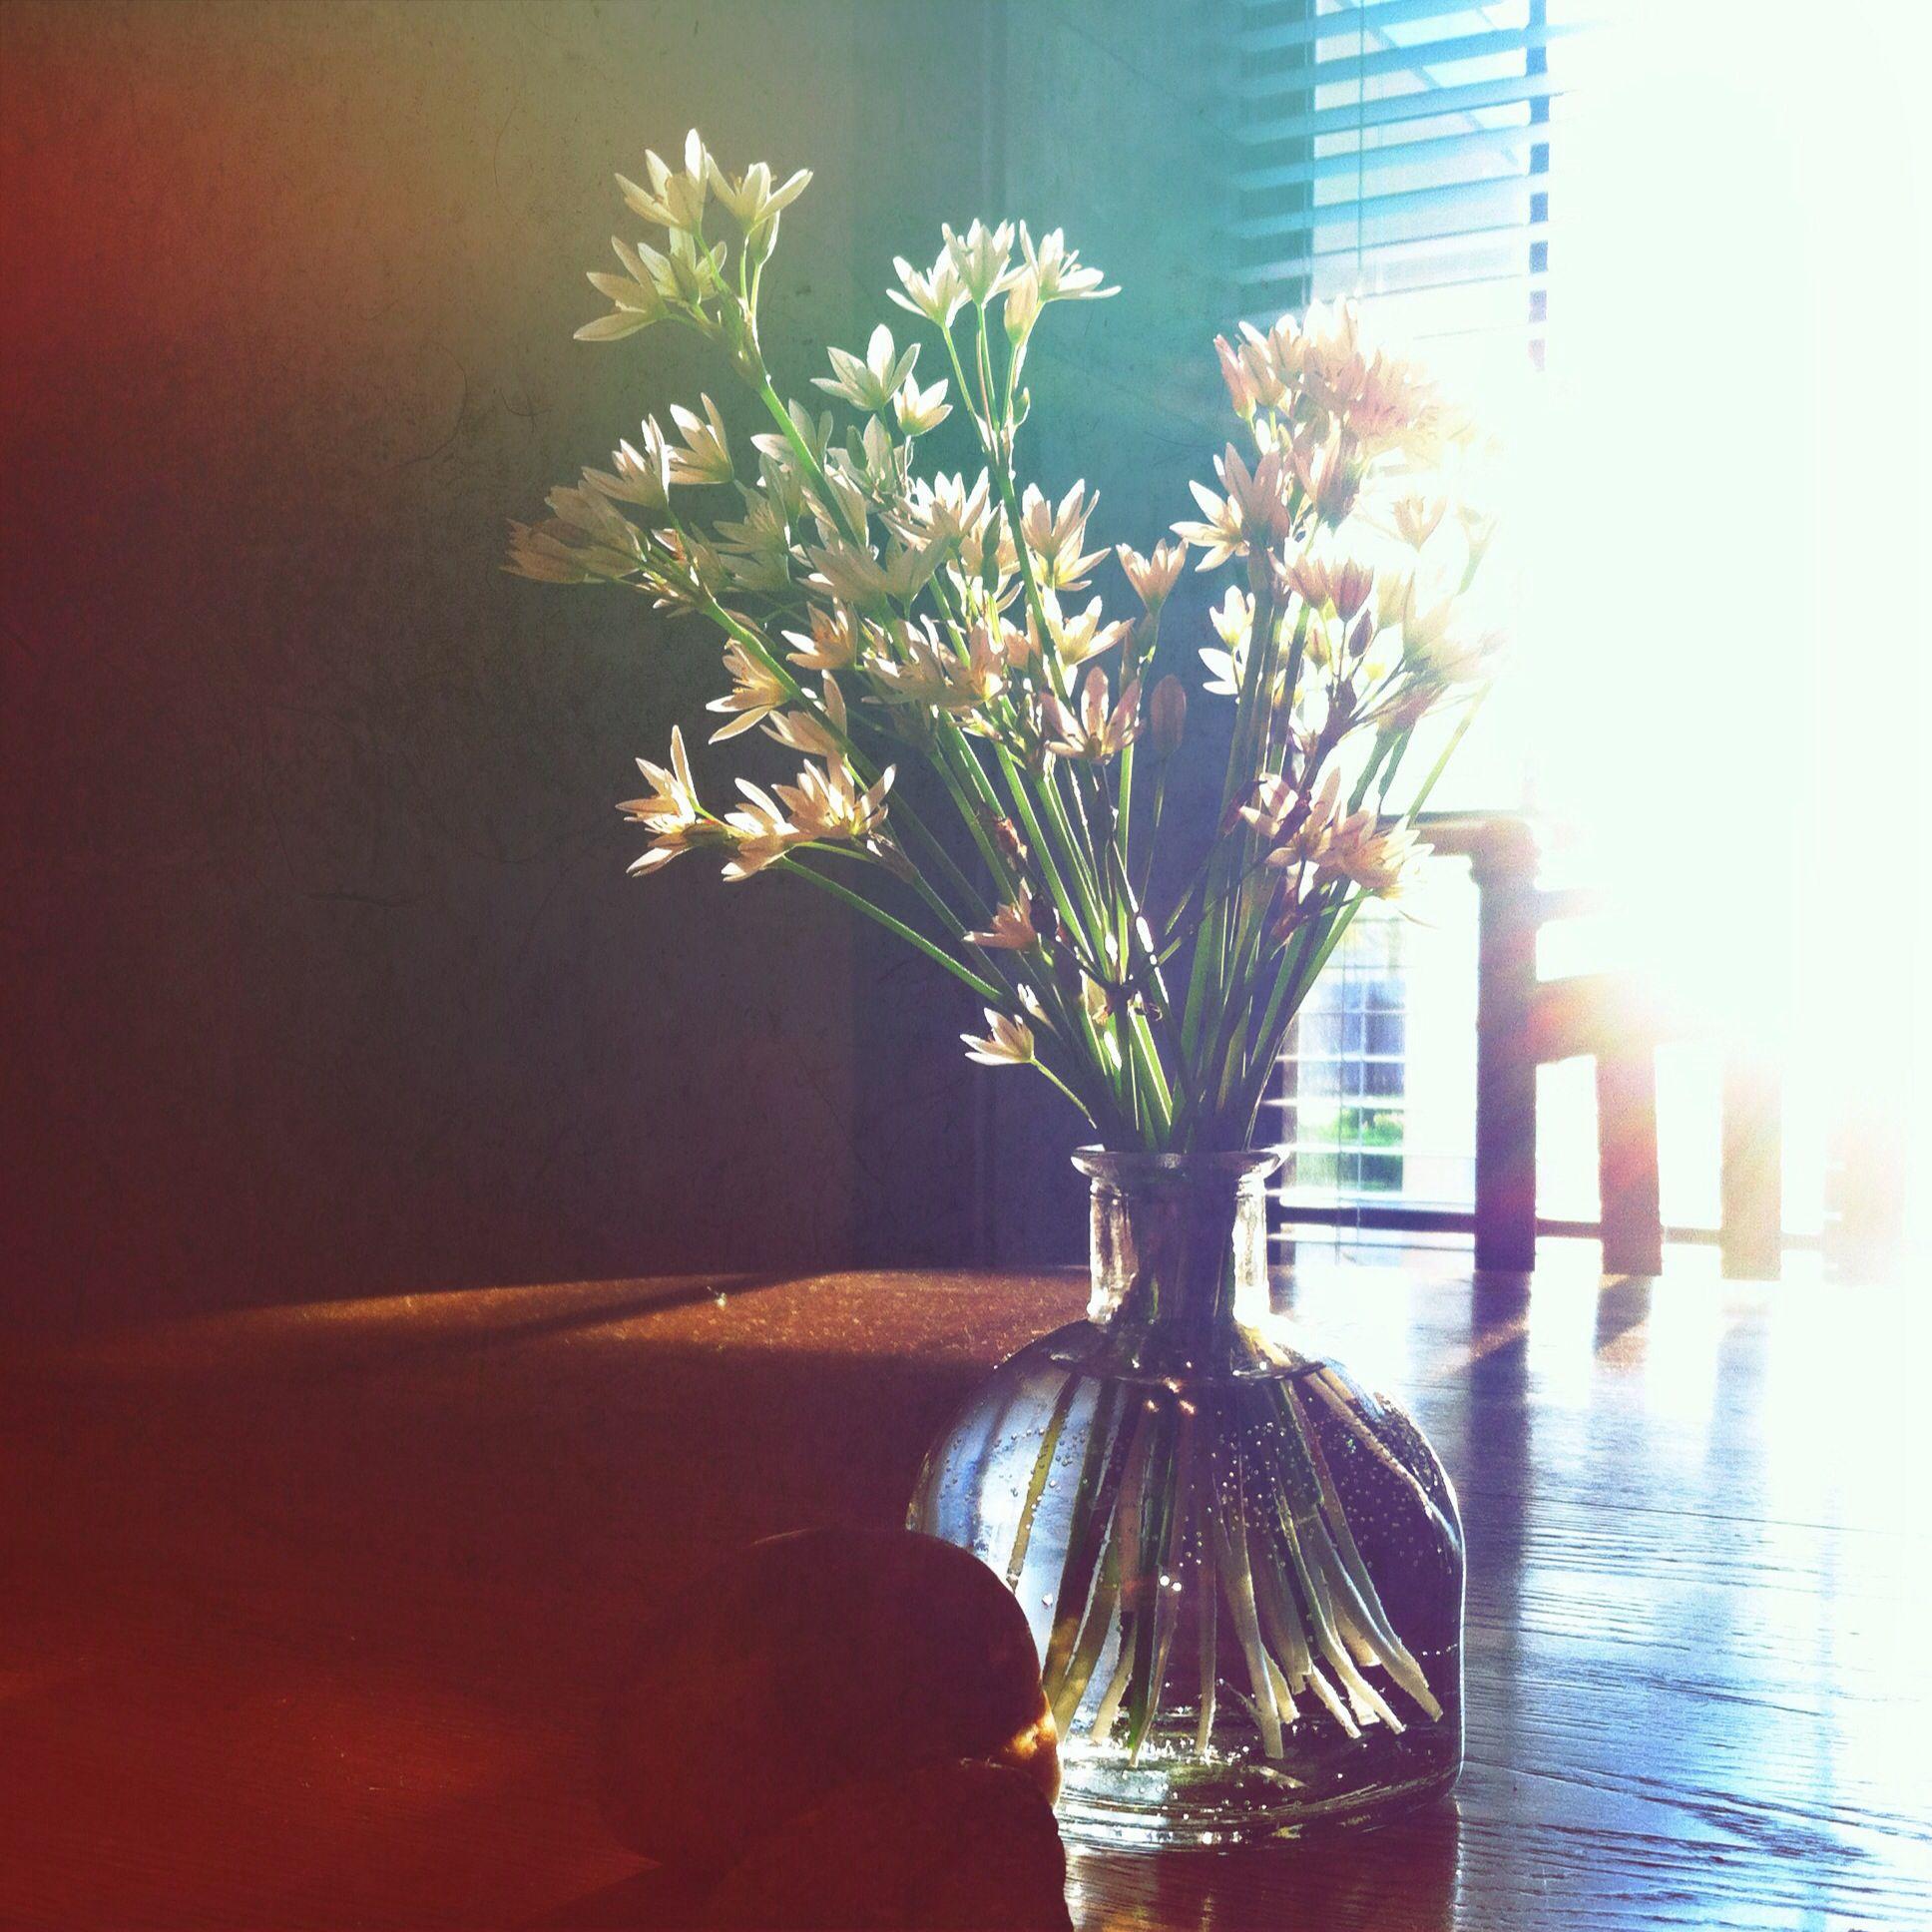 Pretty as a picture.